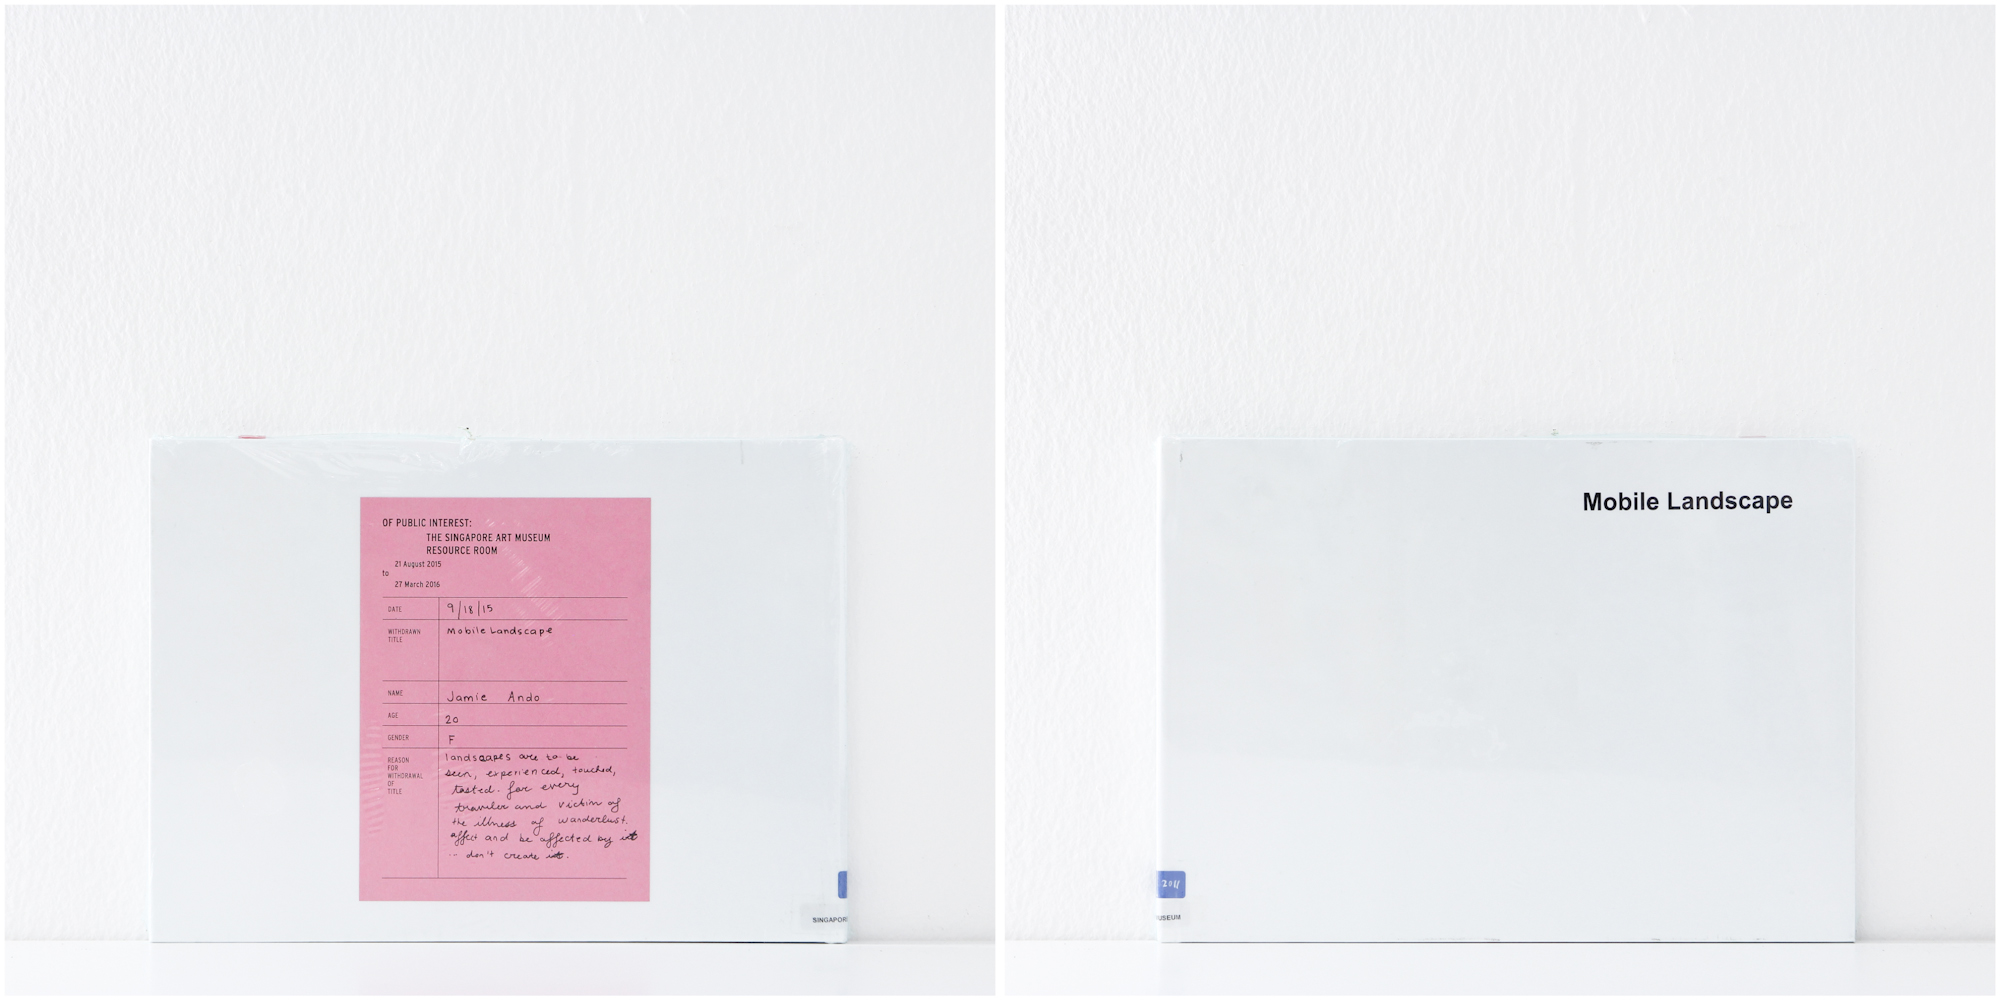 'Mobile Landscape', 18/9/15, Jamie Ando, 20, Female